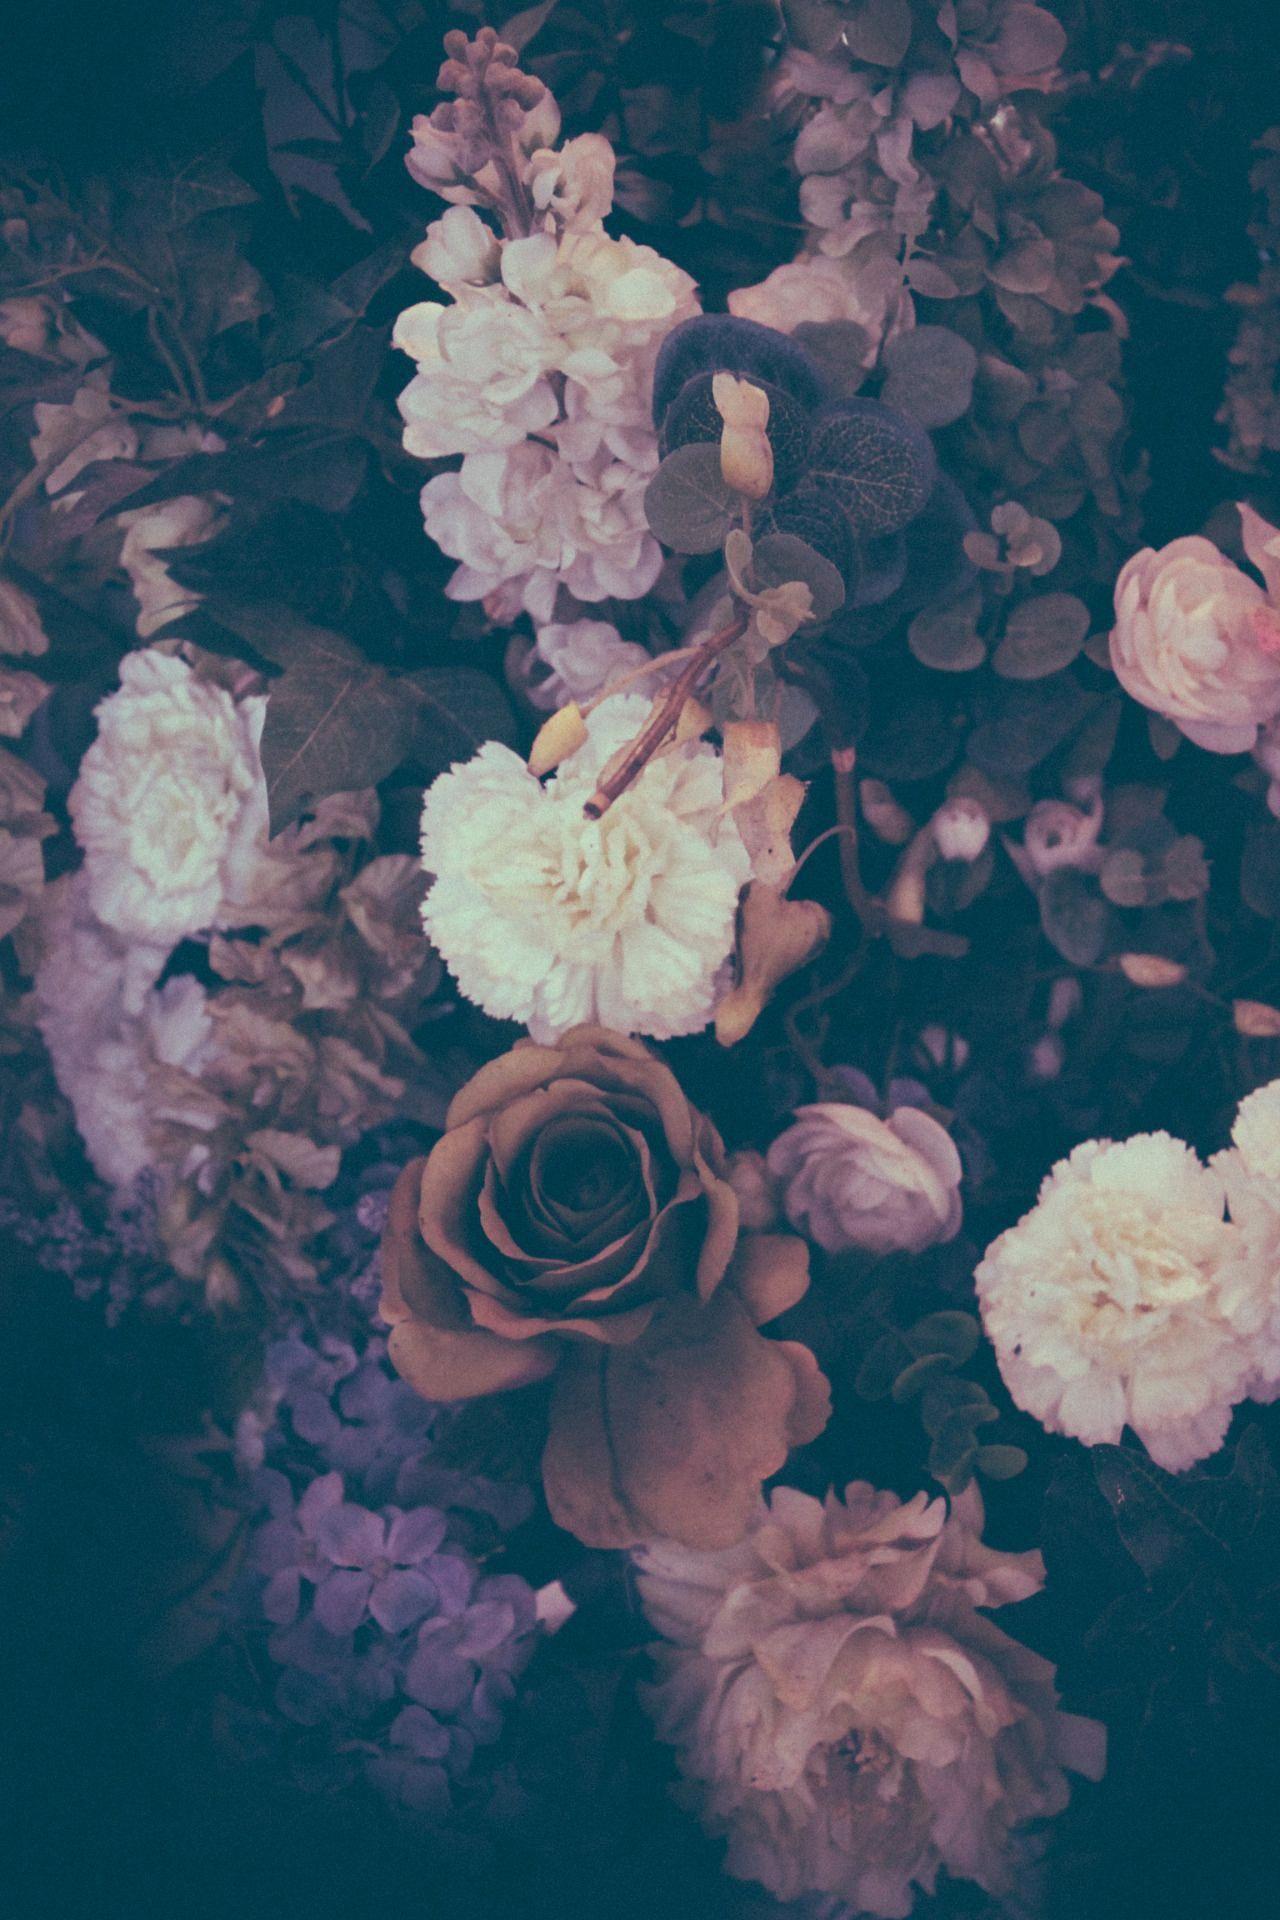 astheticwallpaperiphonebackgrounds Vintage flower